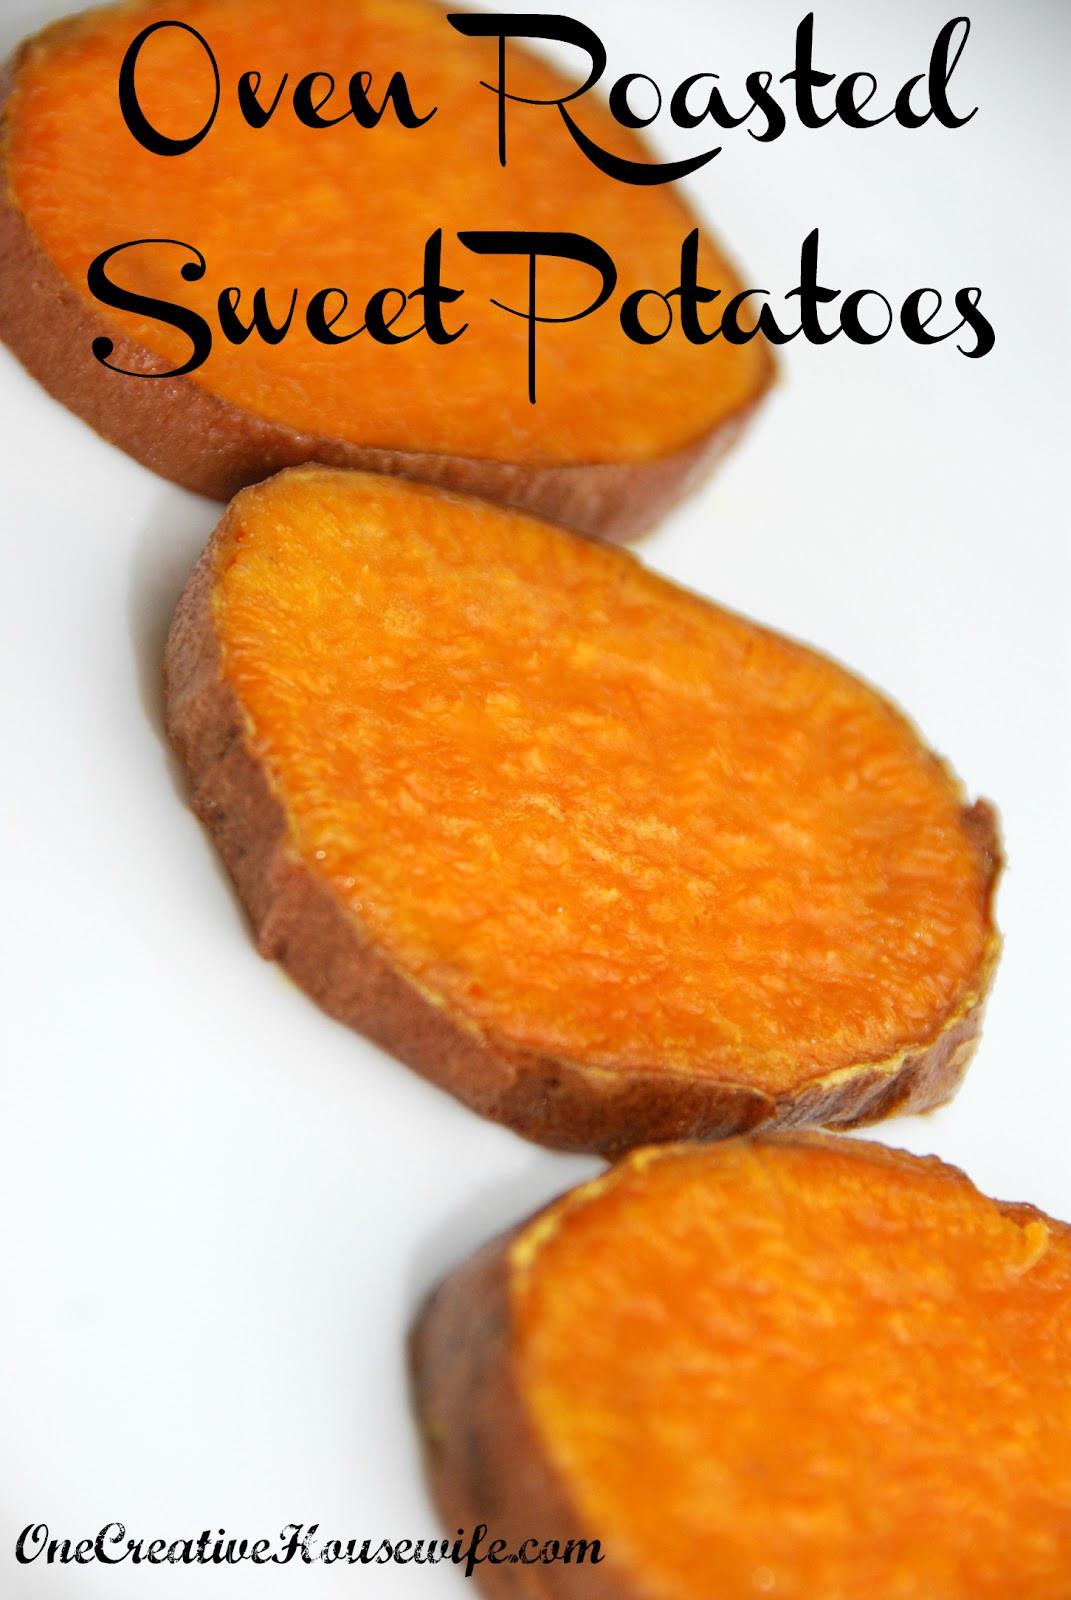 Oven Roasted Sweet Potatoes  e Creative Housewife Oven Roasted Sweet Potatoes